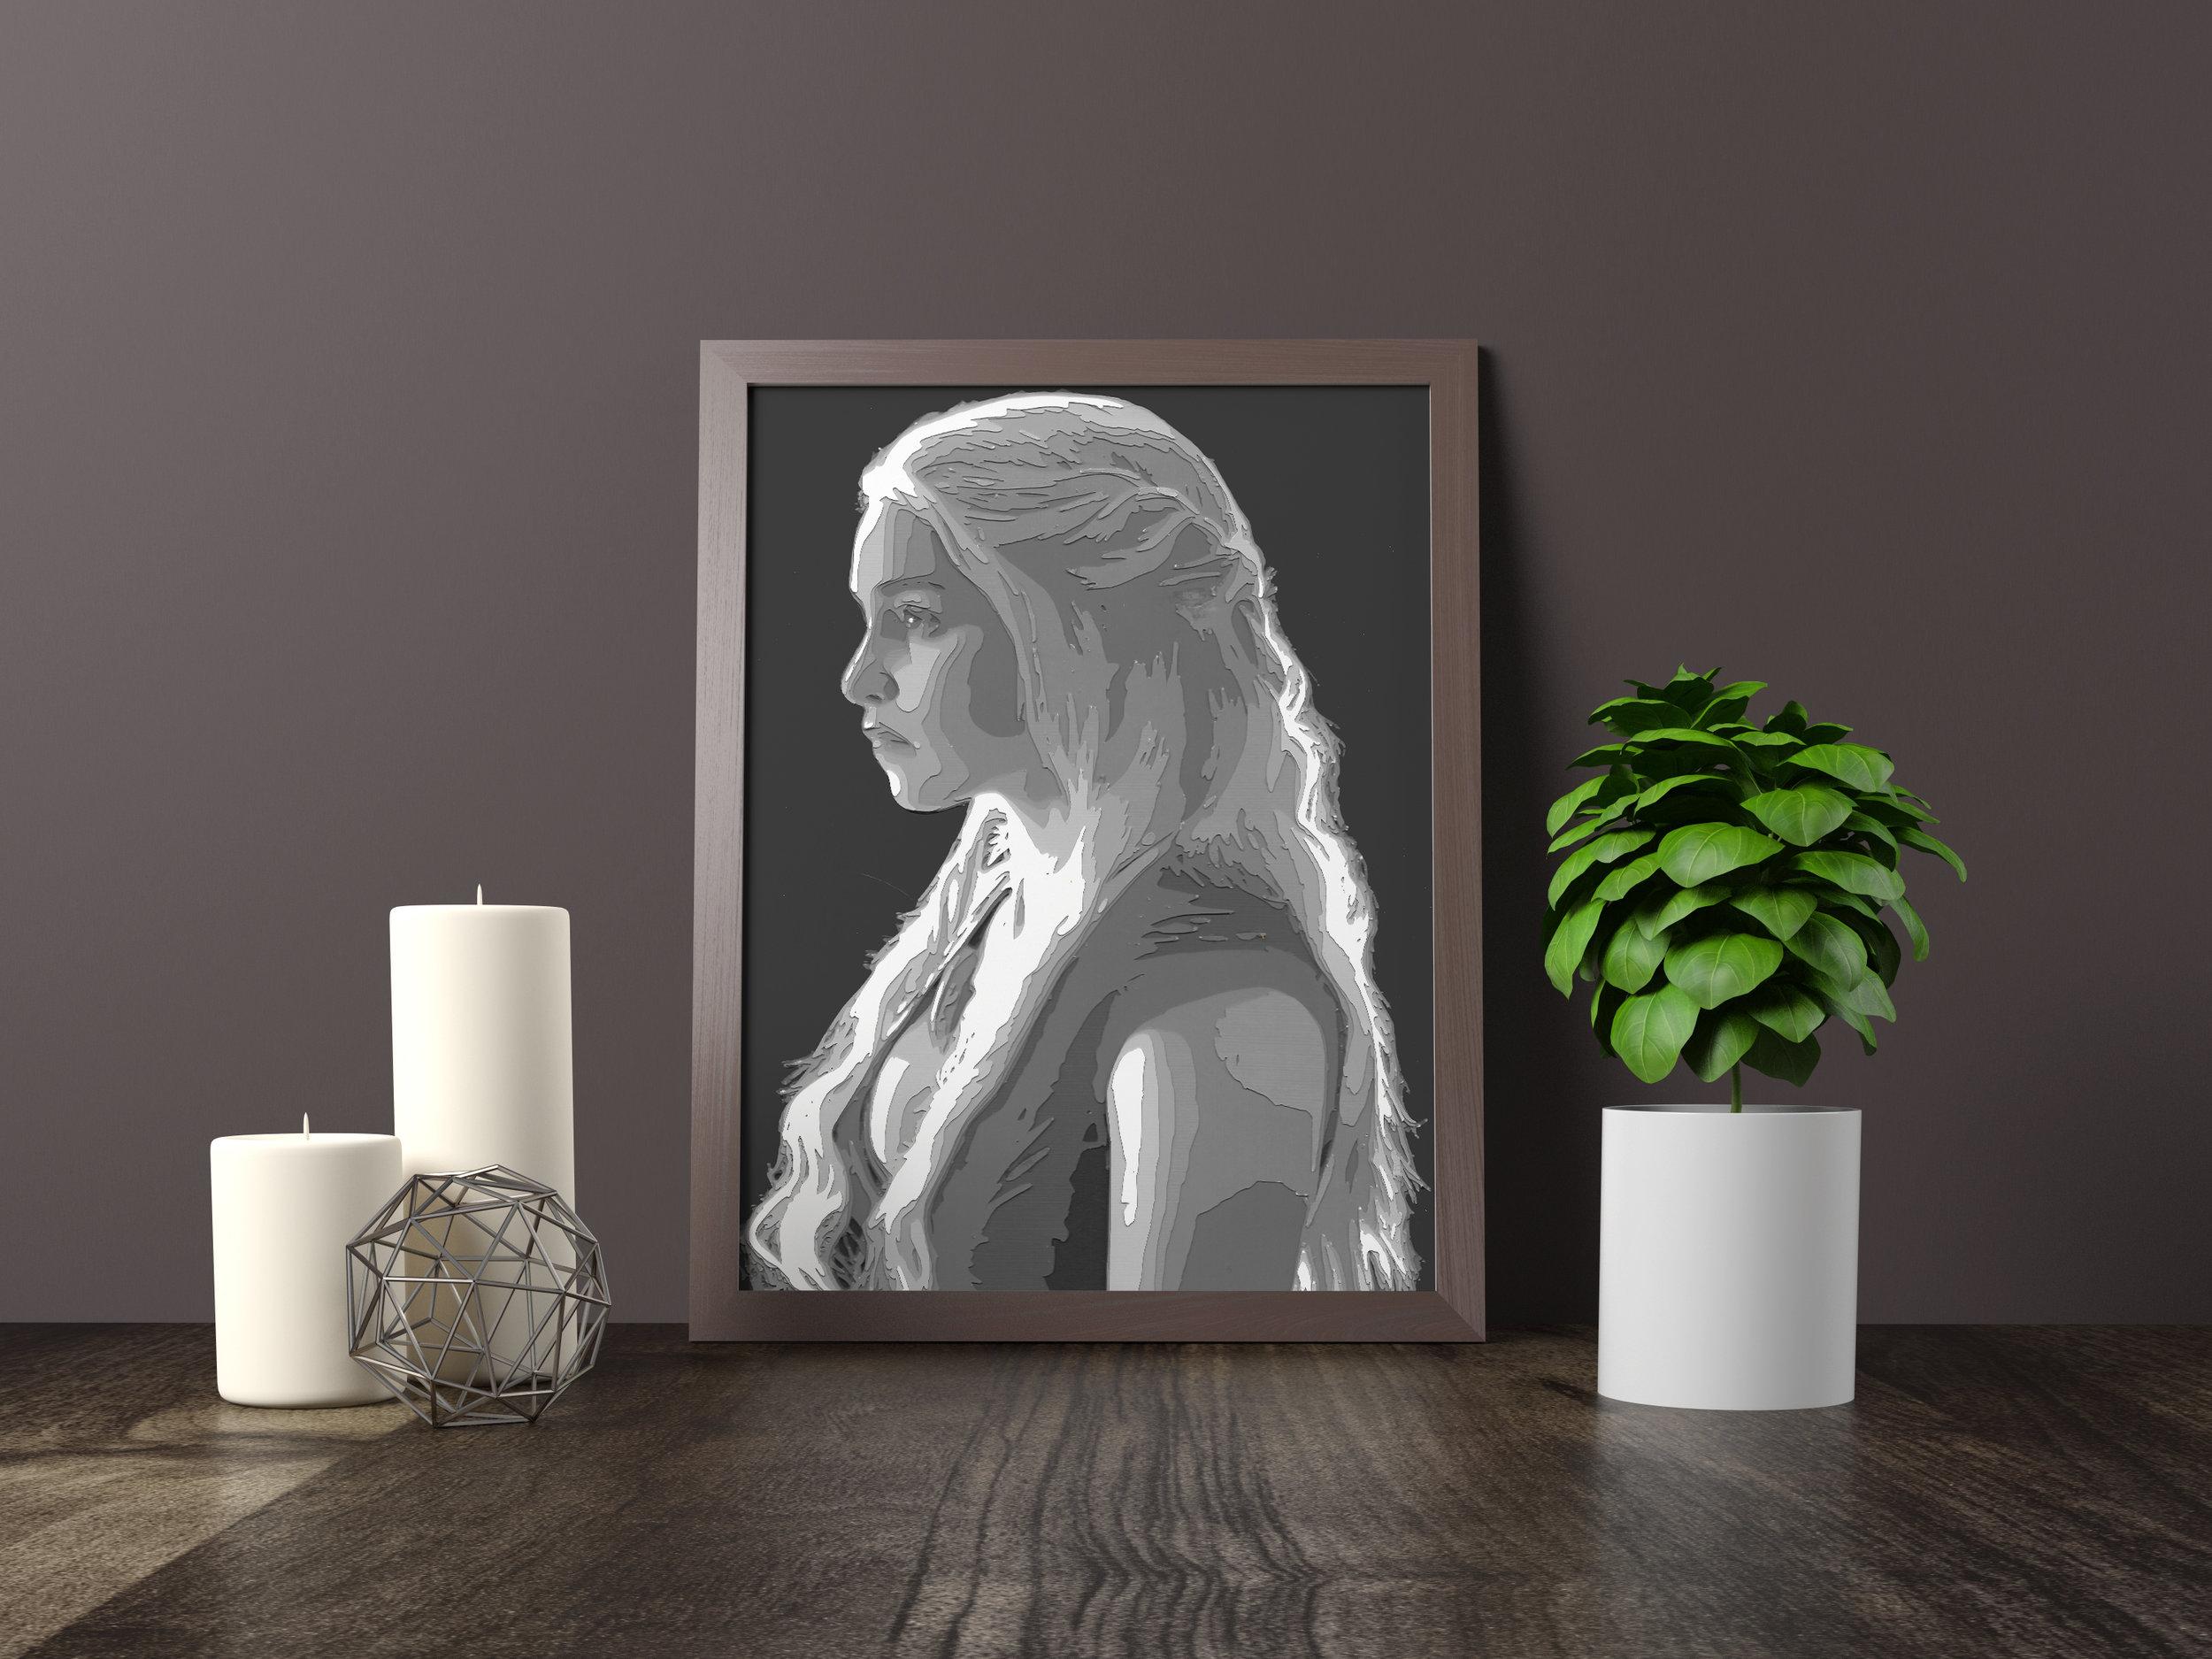 mother of dragons - Original *SOLD*11